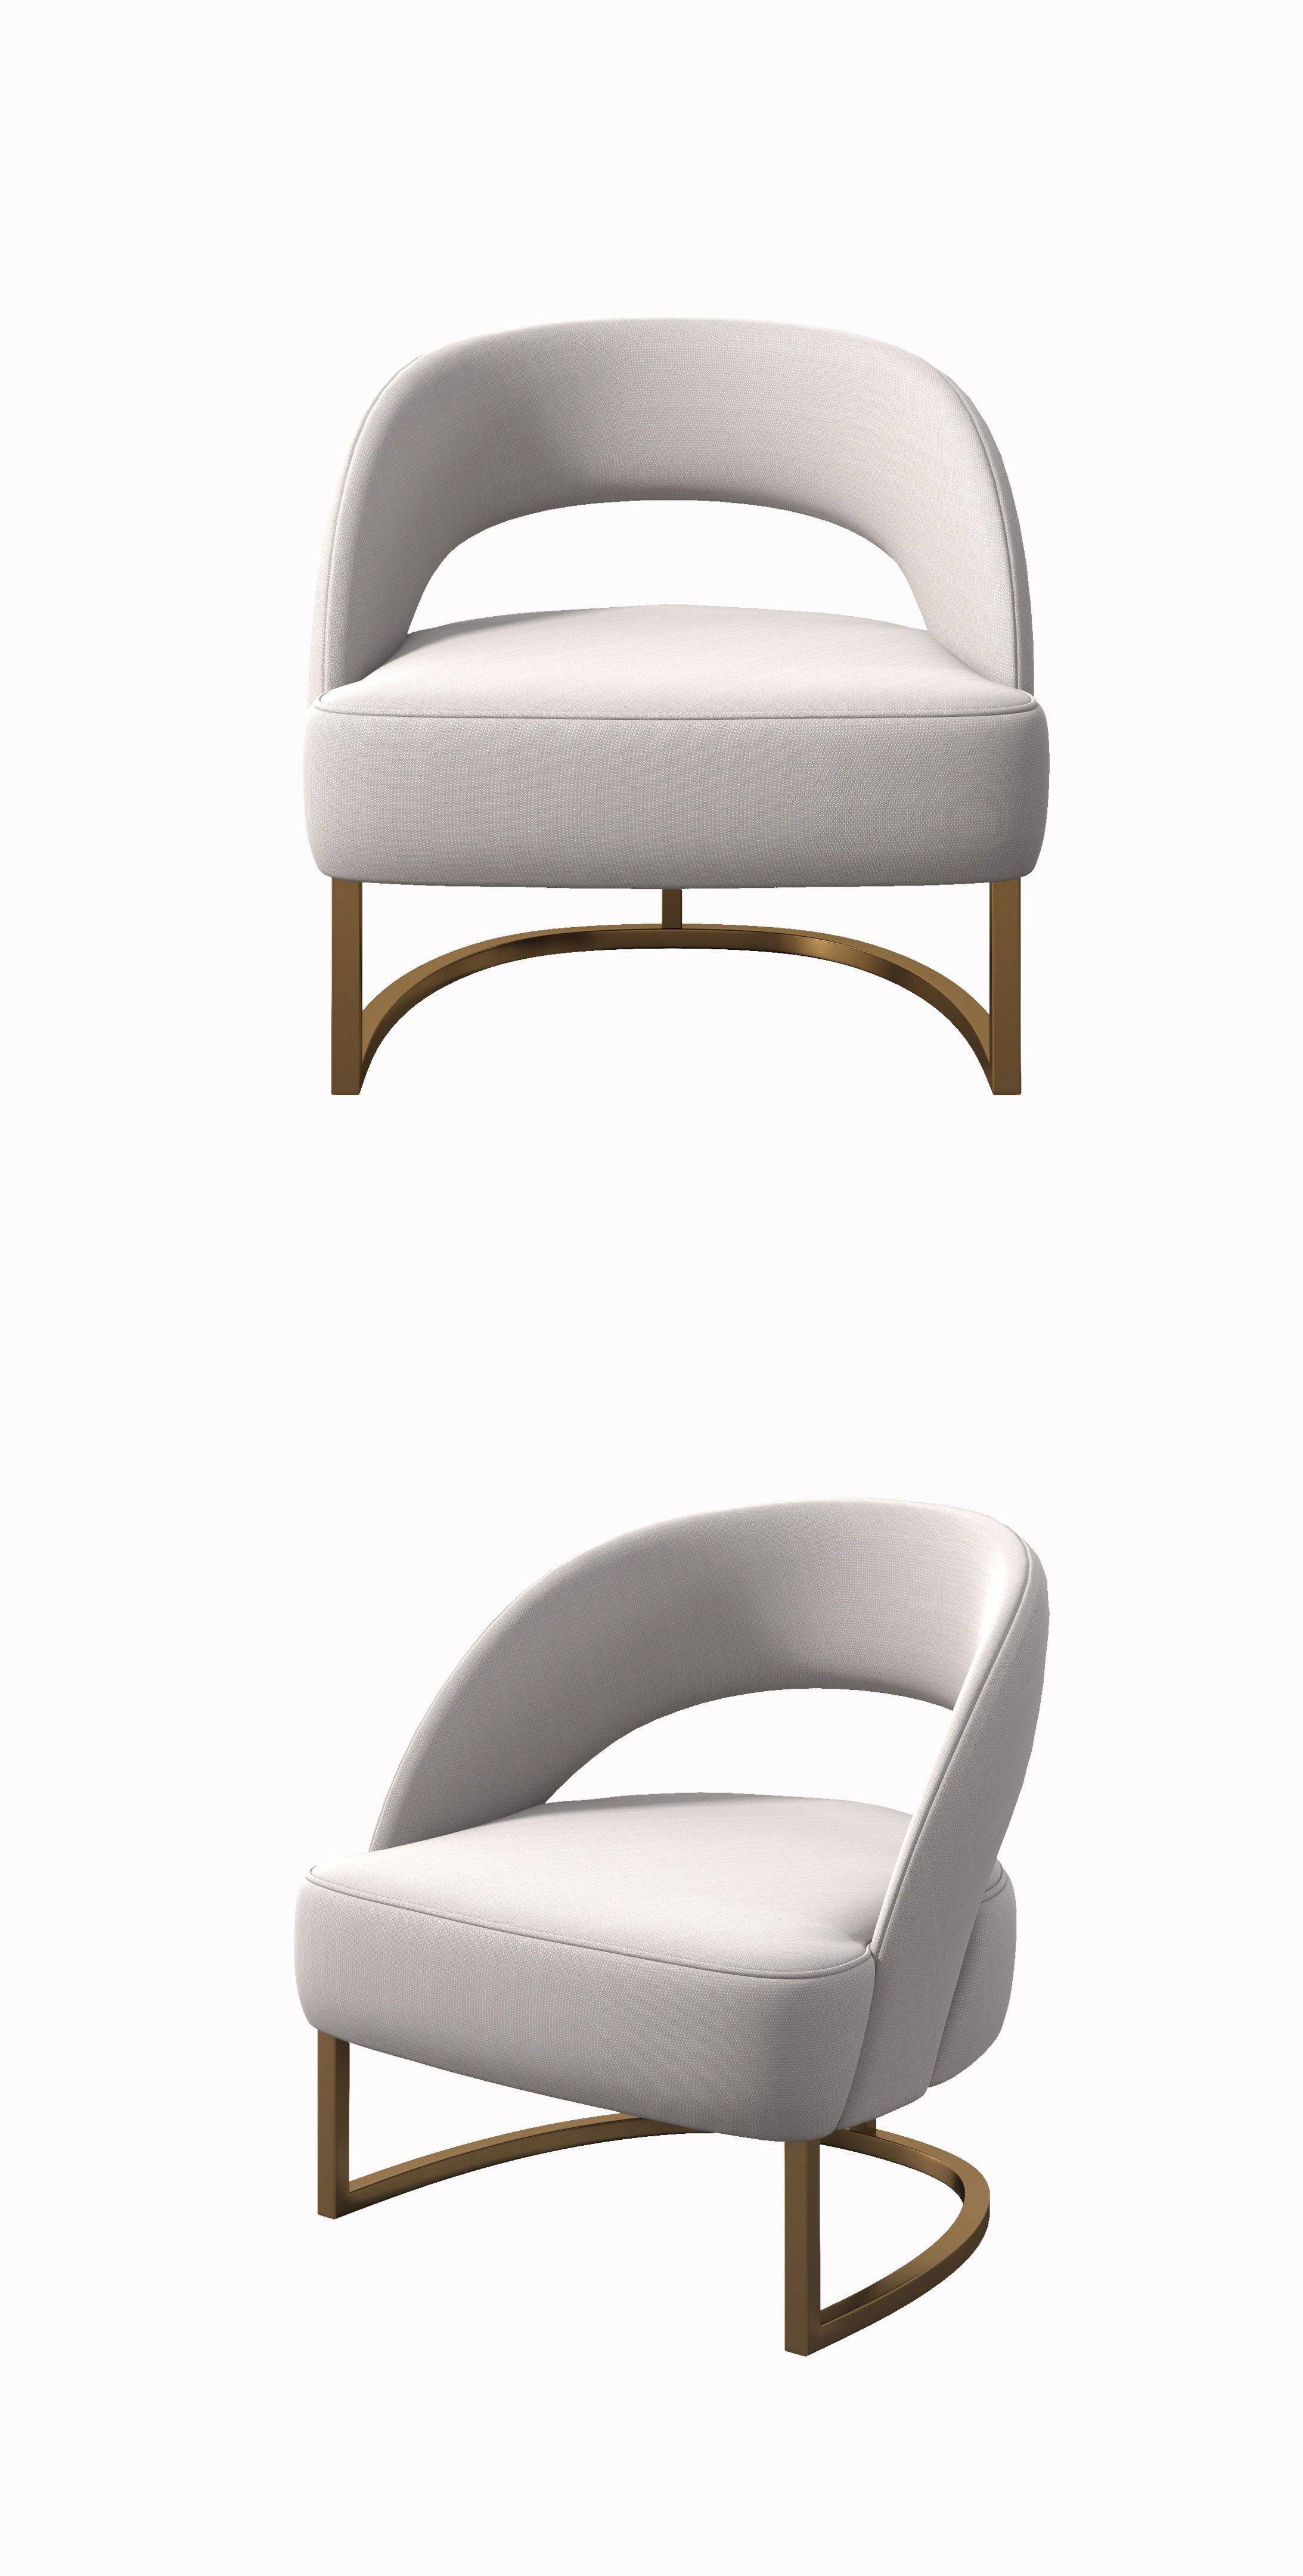 Remarkable Modern Style Sofa Chair Beige Regular Stainless Steel Ibusinesslaw Wood Chair Design Ideas Ibusinesslaworg